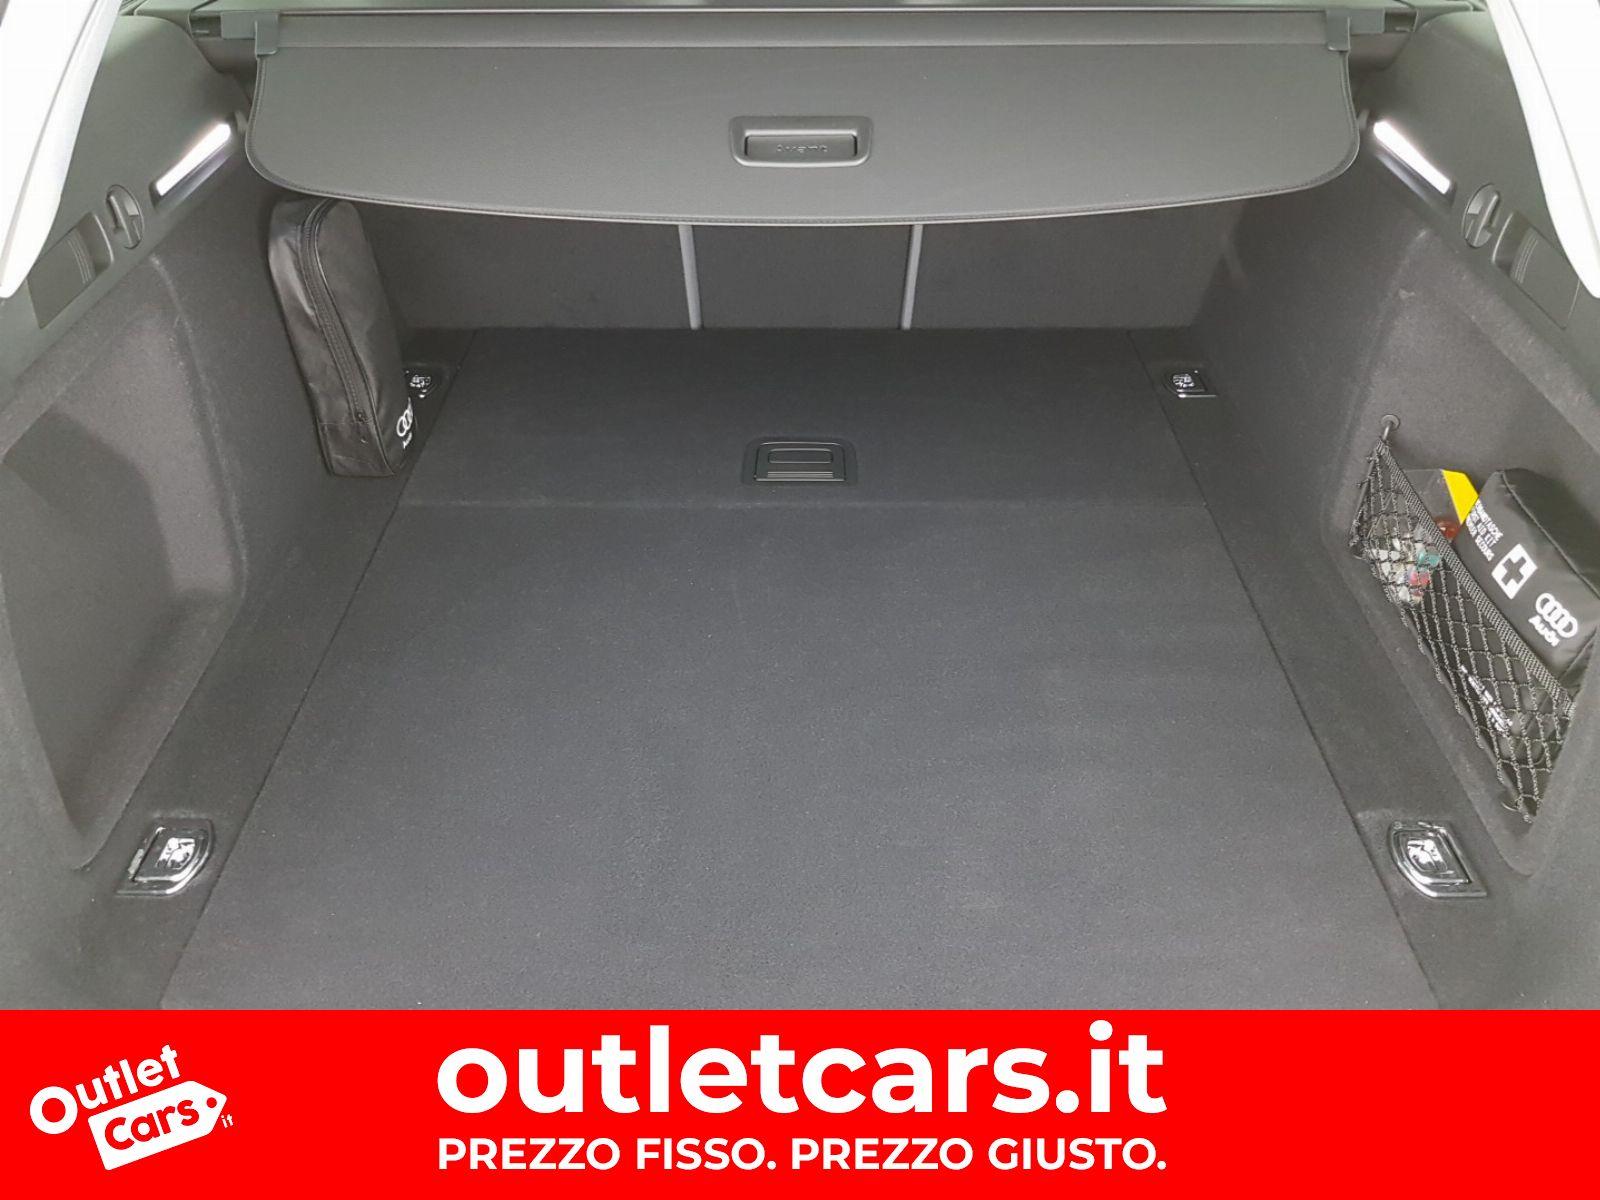 audi a4 avant 2 0 tfsi g tron 170cv s tronic. Black Bedroom Furniture Sets. Home Design Ideas